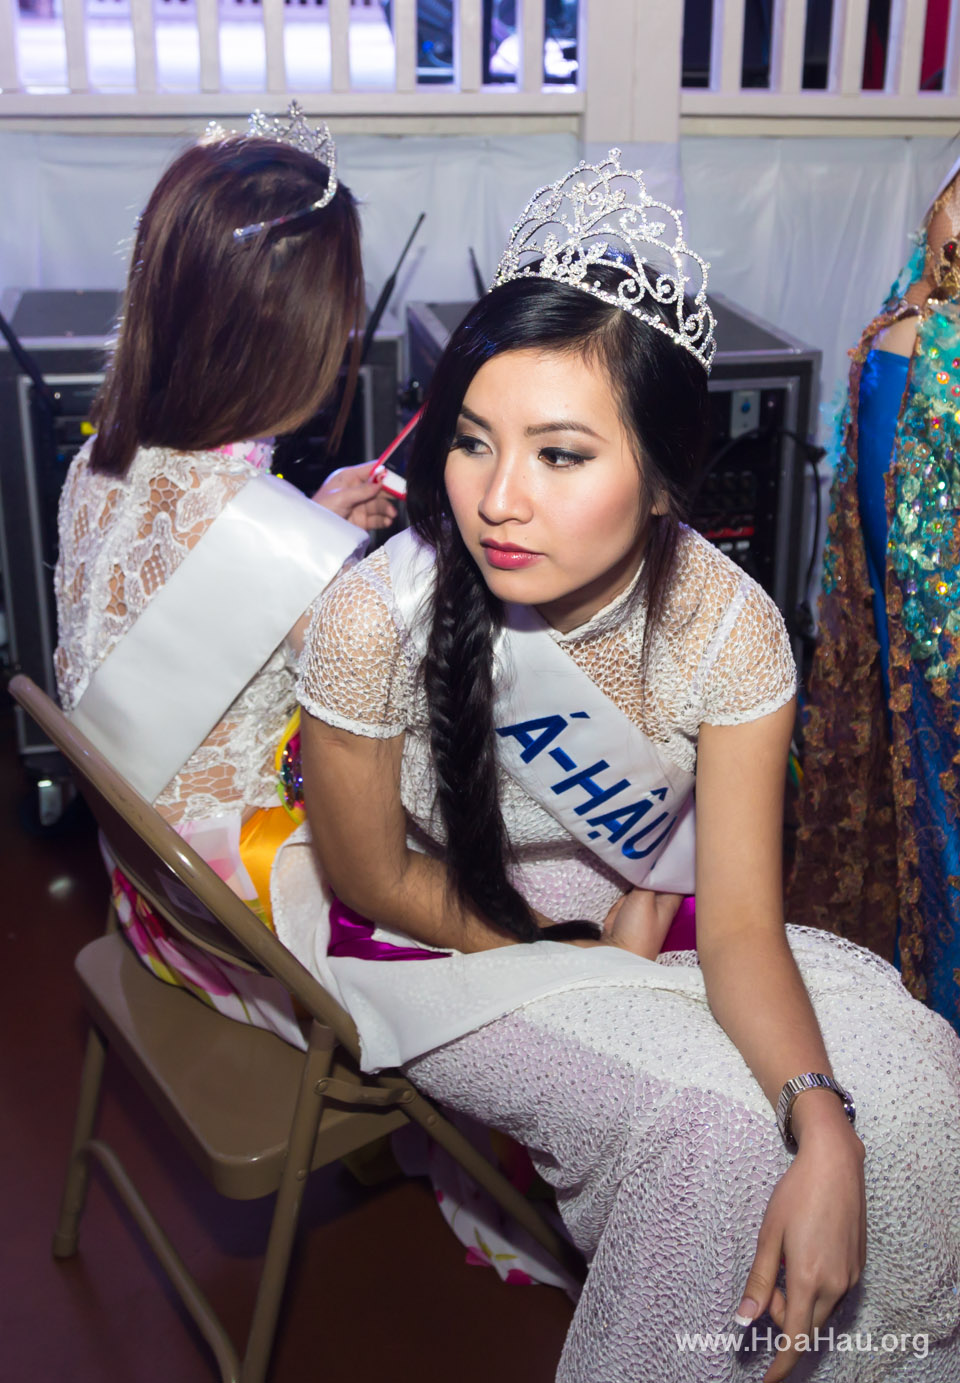 Tet Fairgrounds 2014 - Hoa Hậu Áo Dài Bắc Cali - Miss Vietnam of Northern California - Image 151